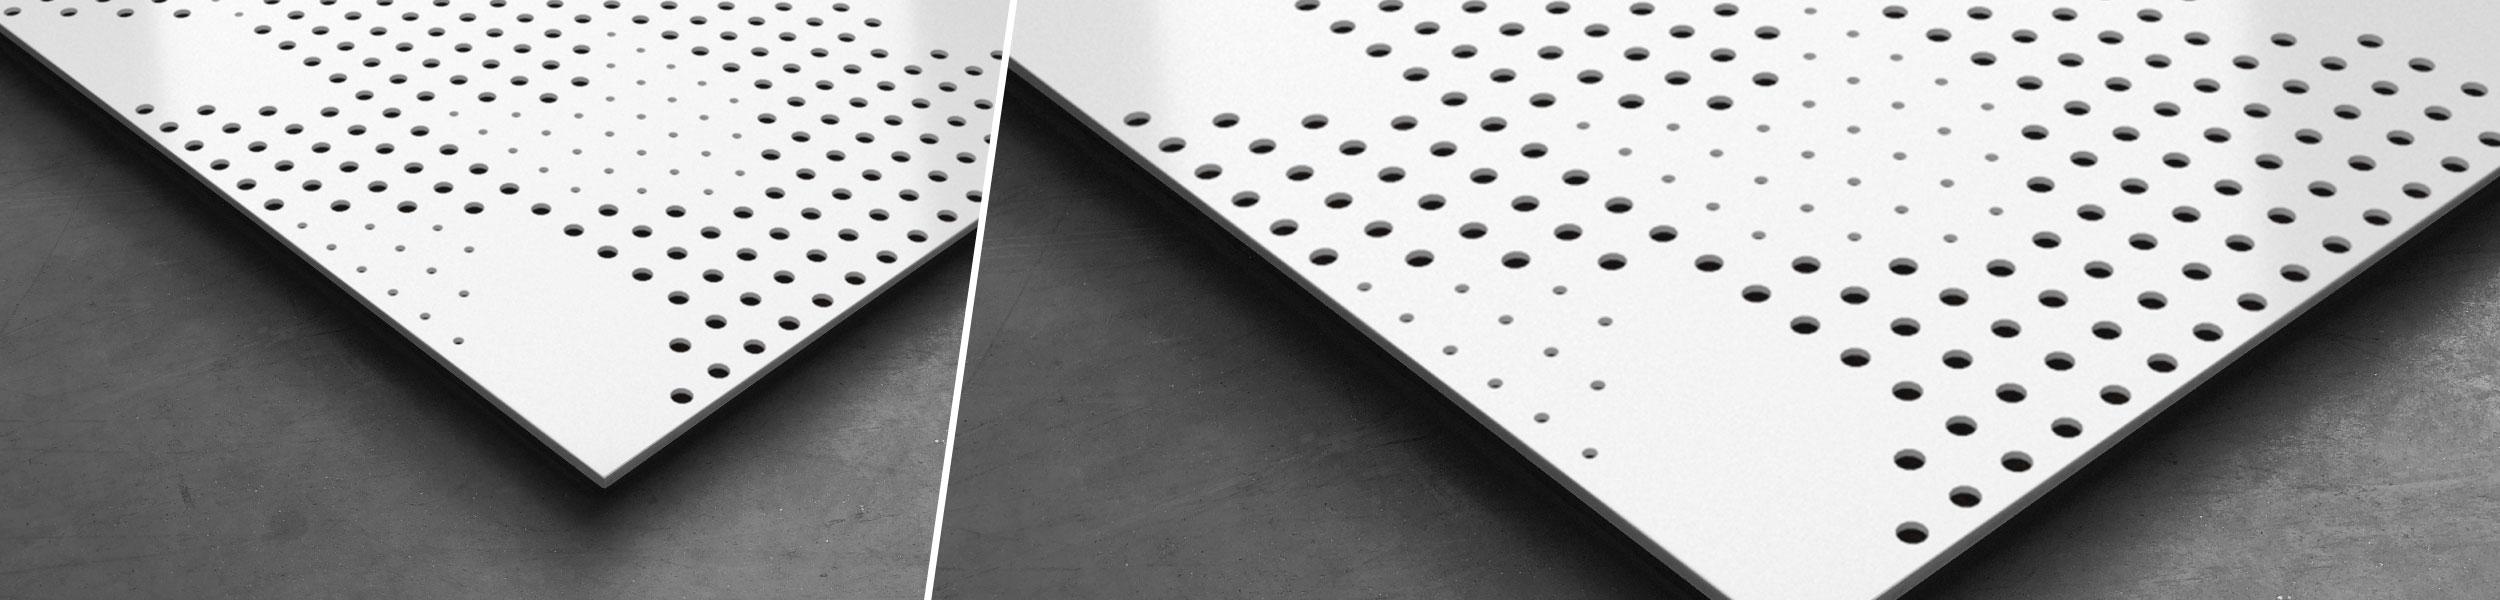 Artnovion product komodo panelling d37f301566